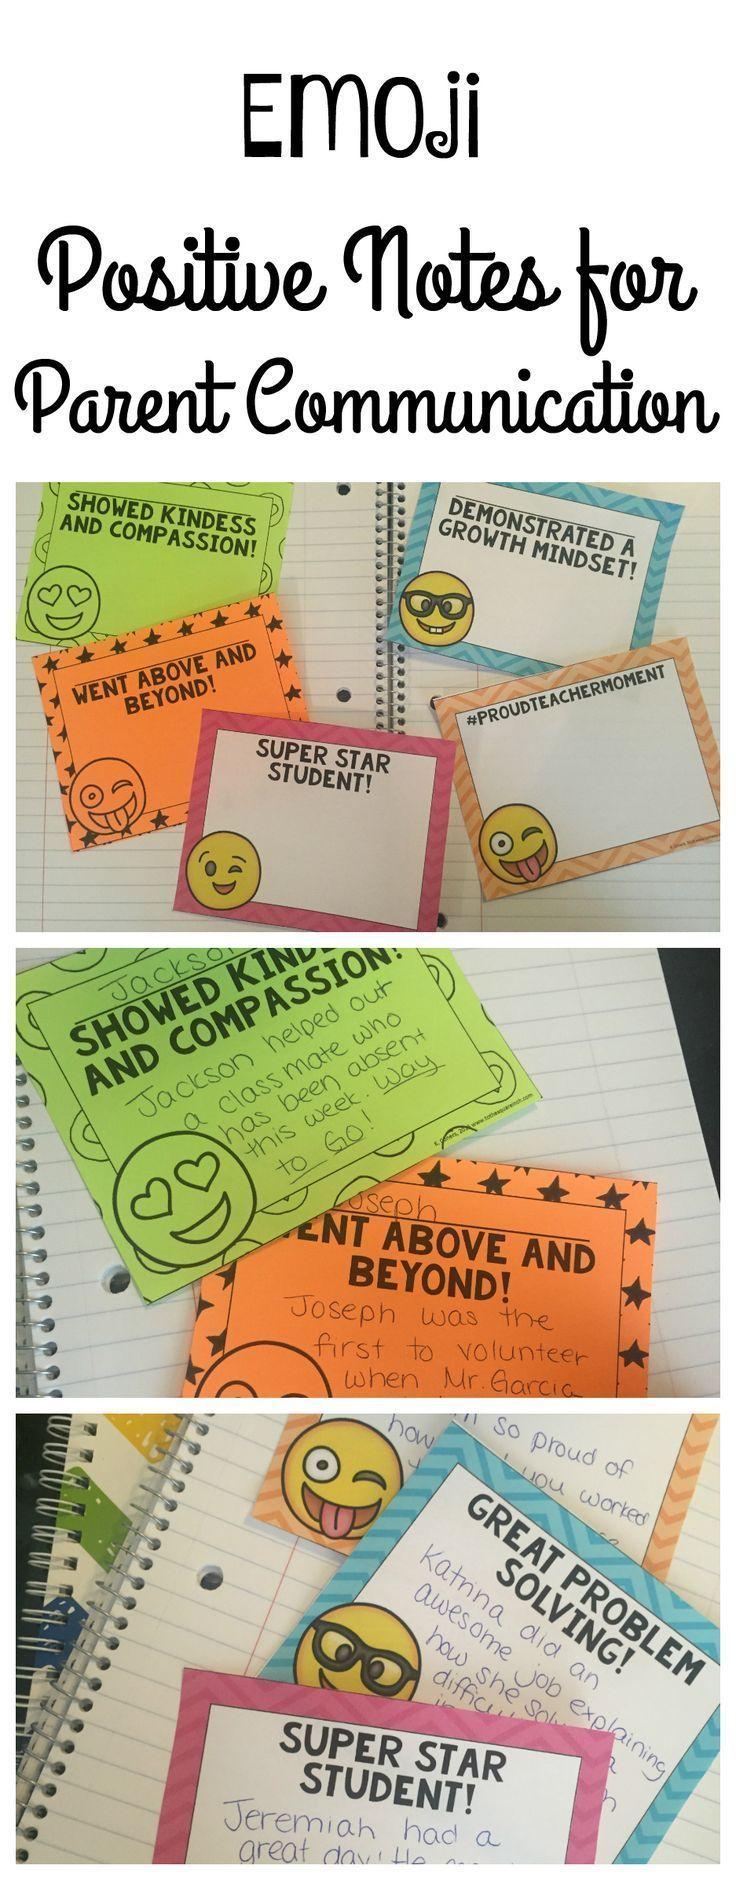 Emoji Positive Notes Home for Parent Communication